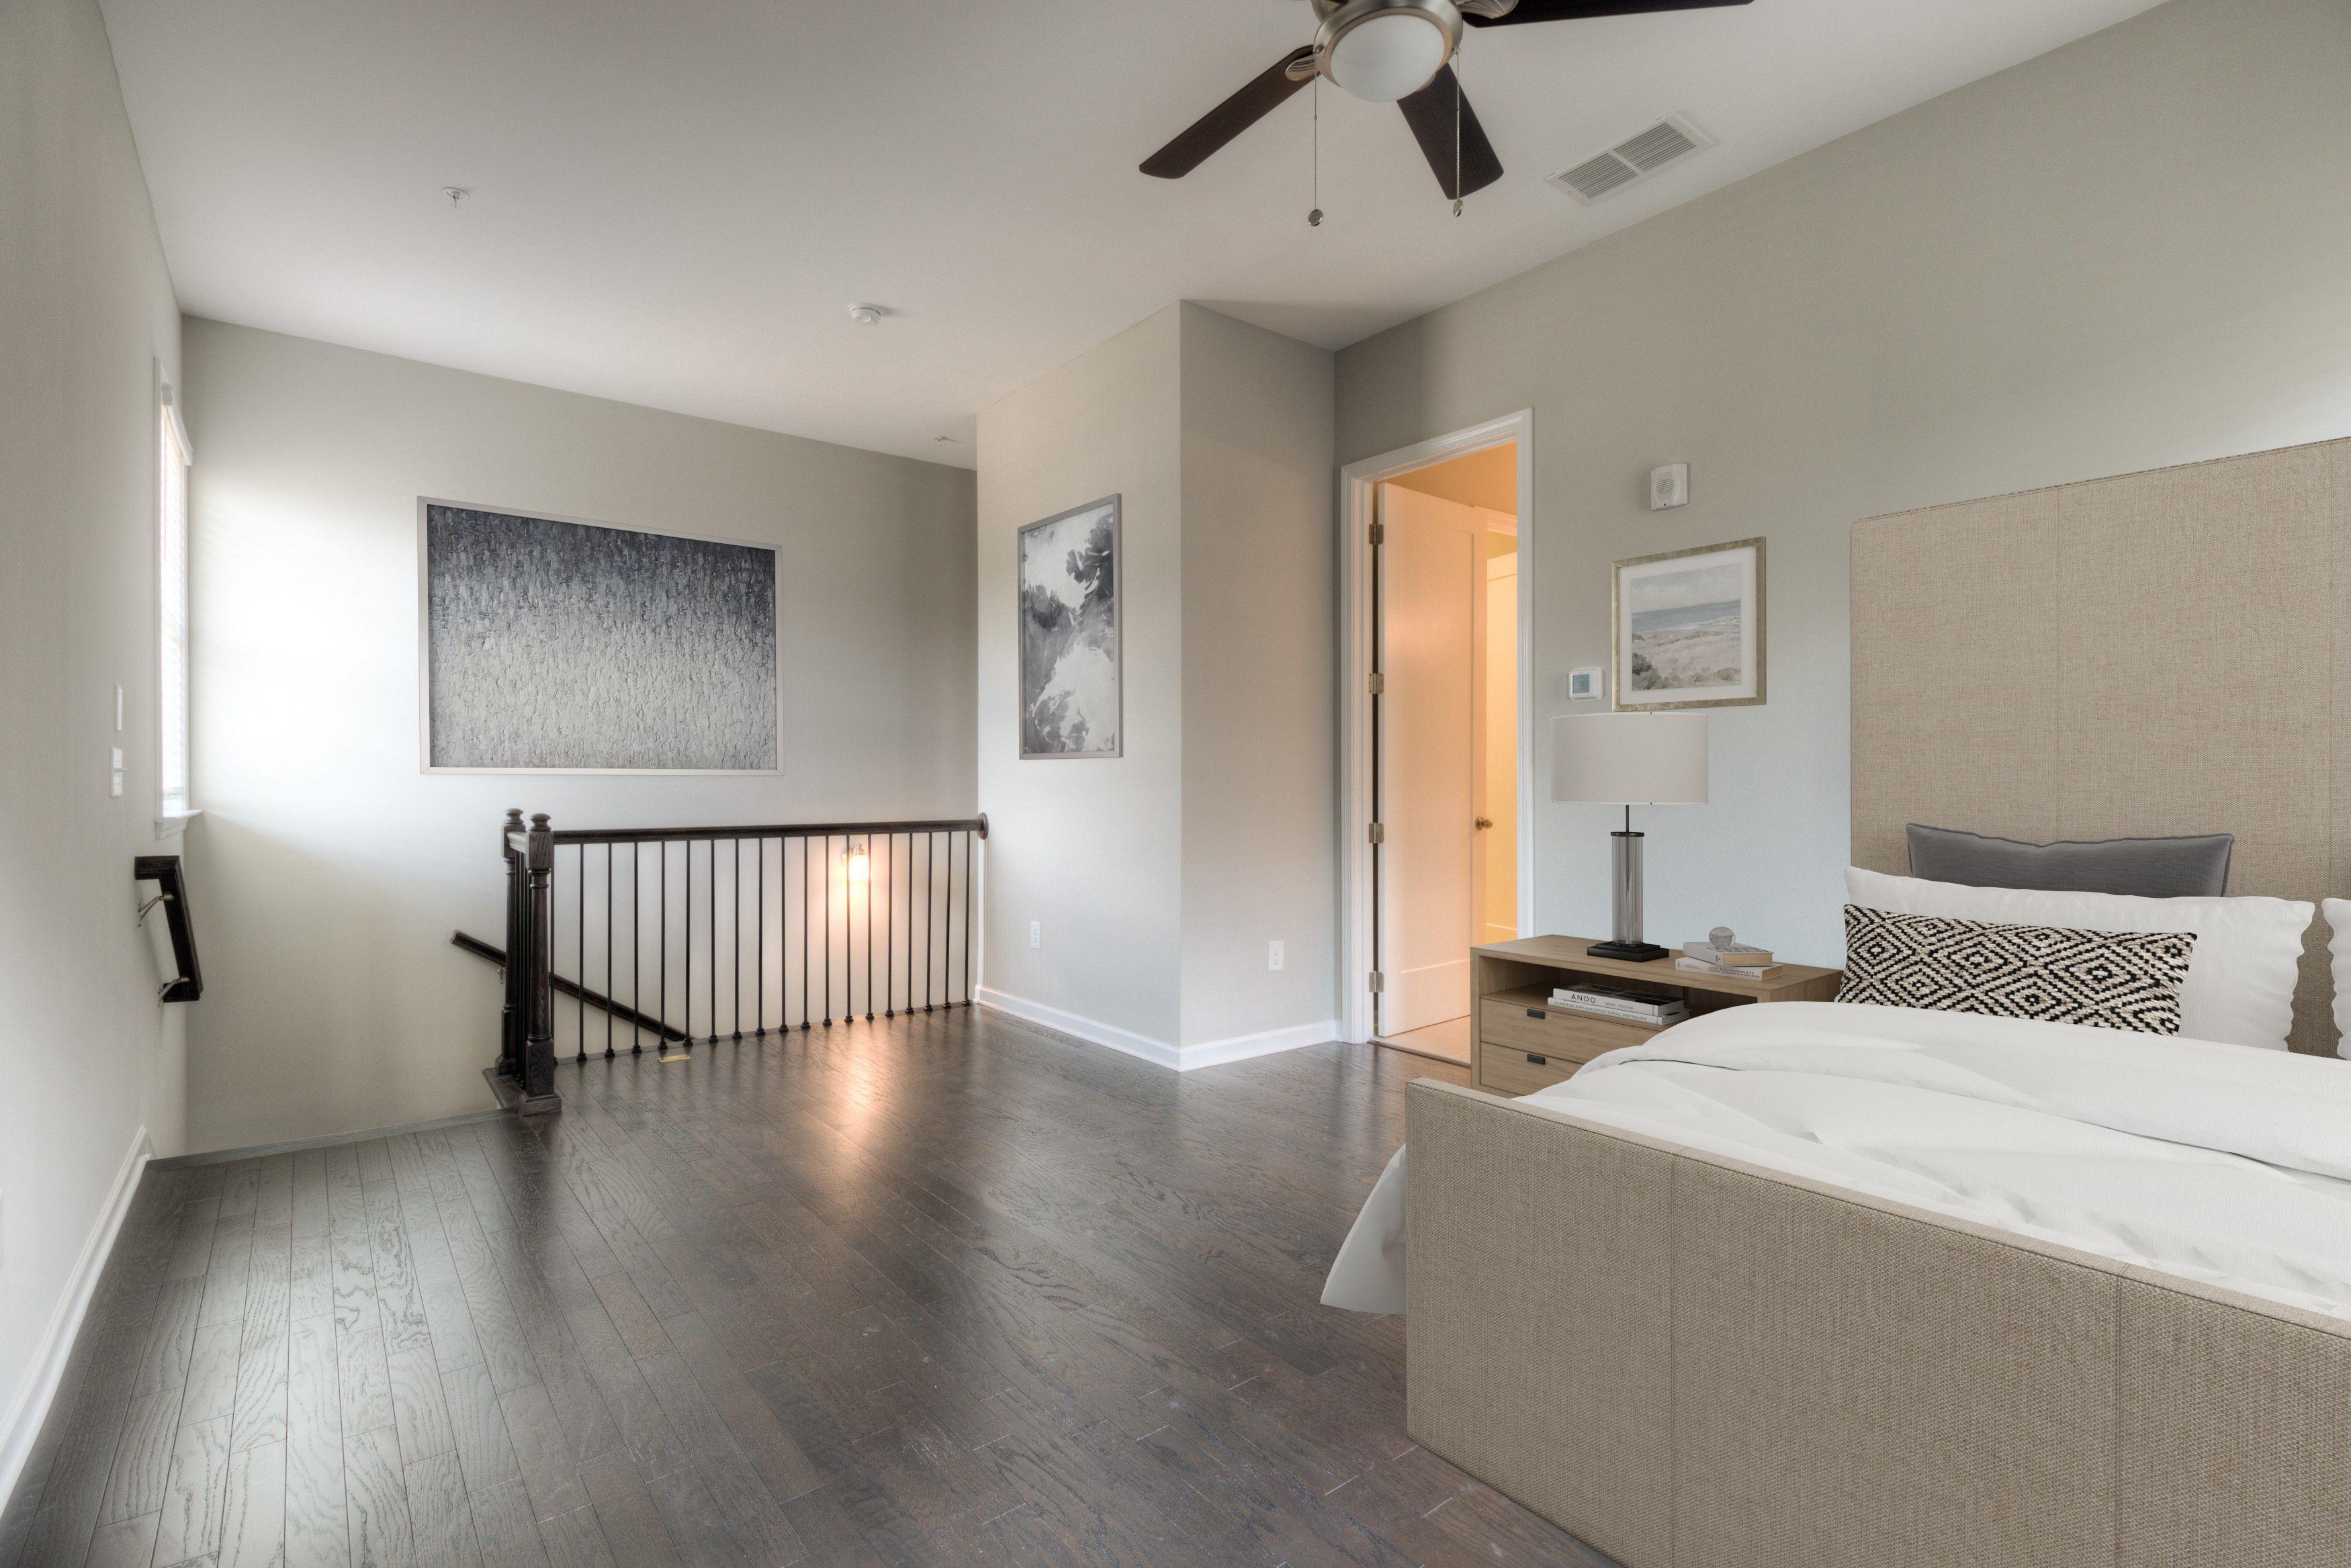 Bedroom featured in the Brahms By Ashton Woods in Atlanta, GA